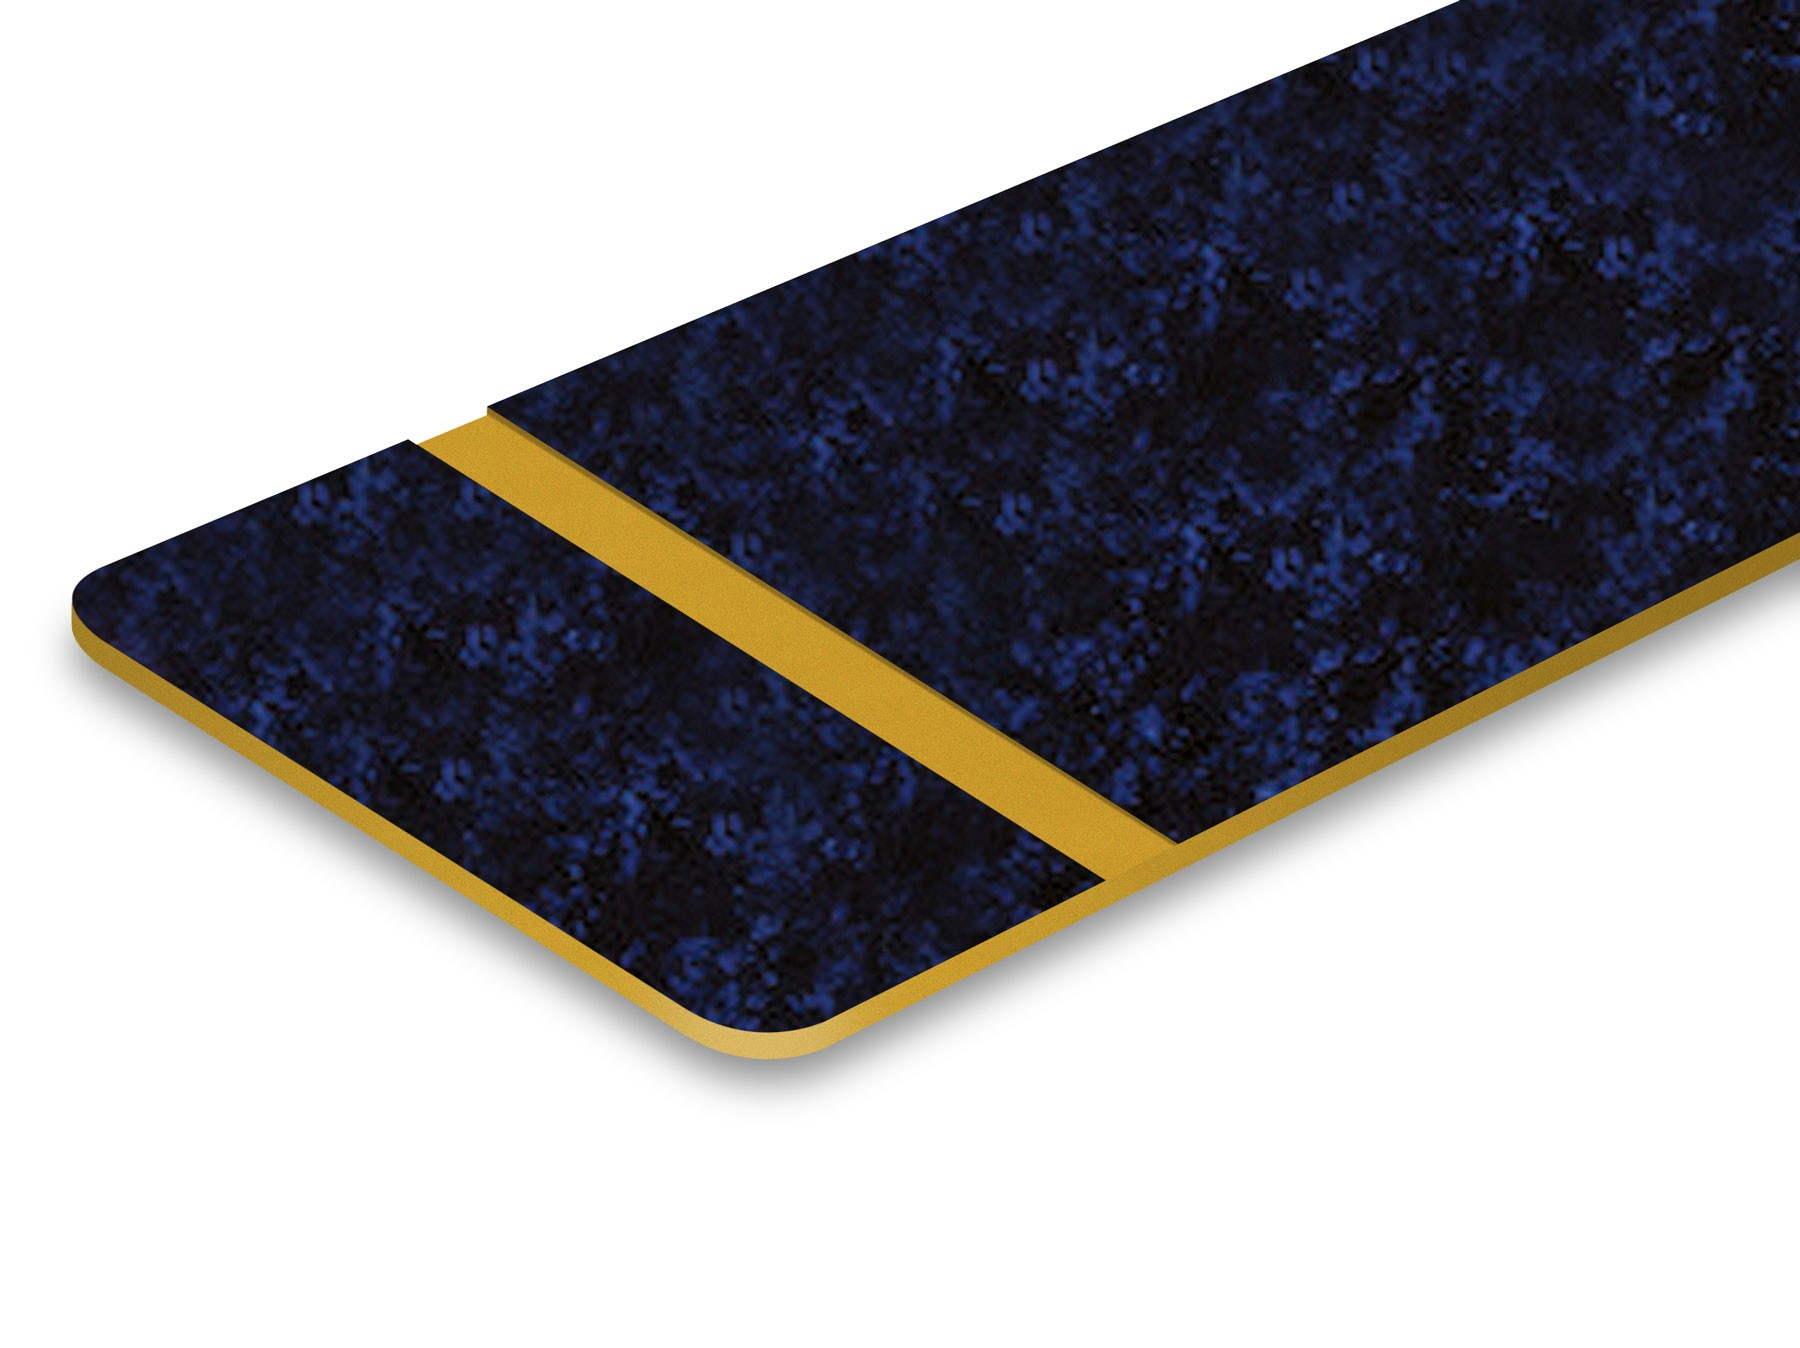 Blu Celeste/Oro 0,5mm